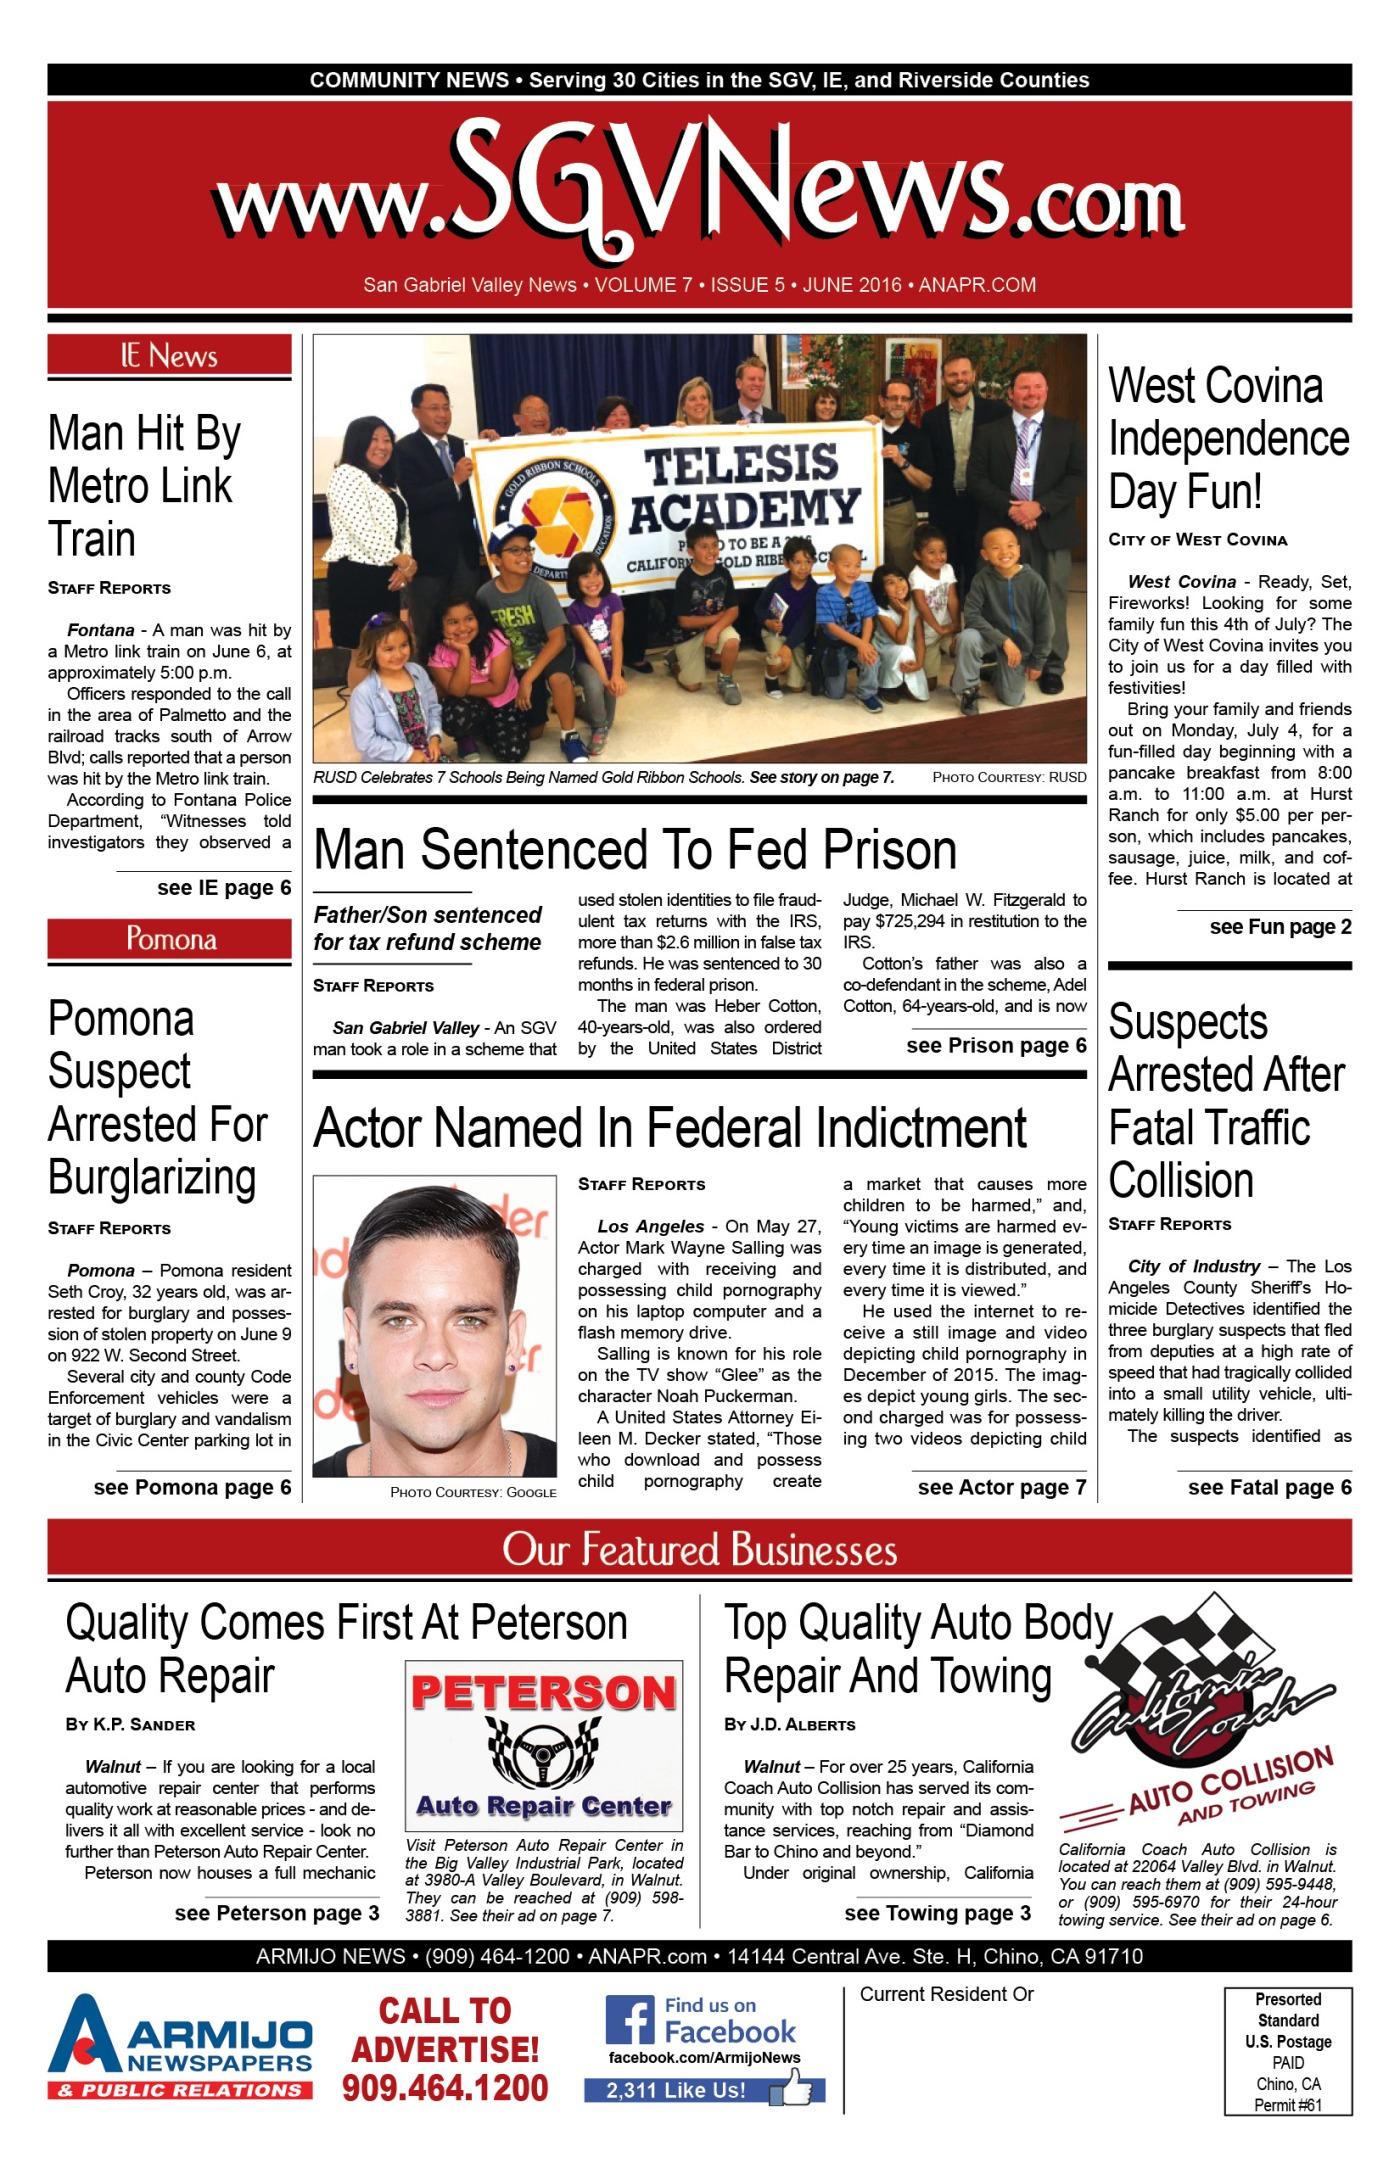 June 2016 SGV News – ABCpr Media Group -Community News, Public